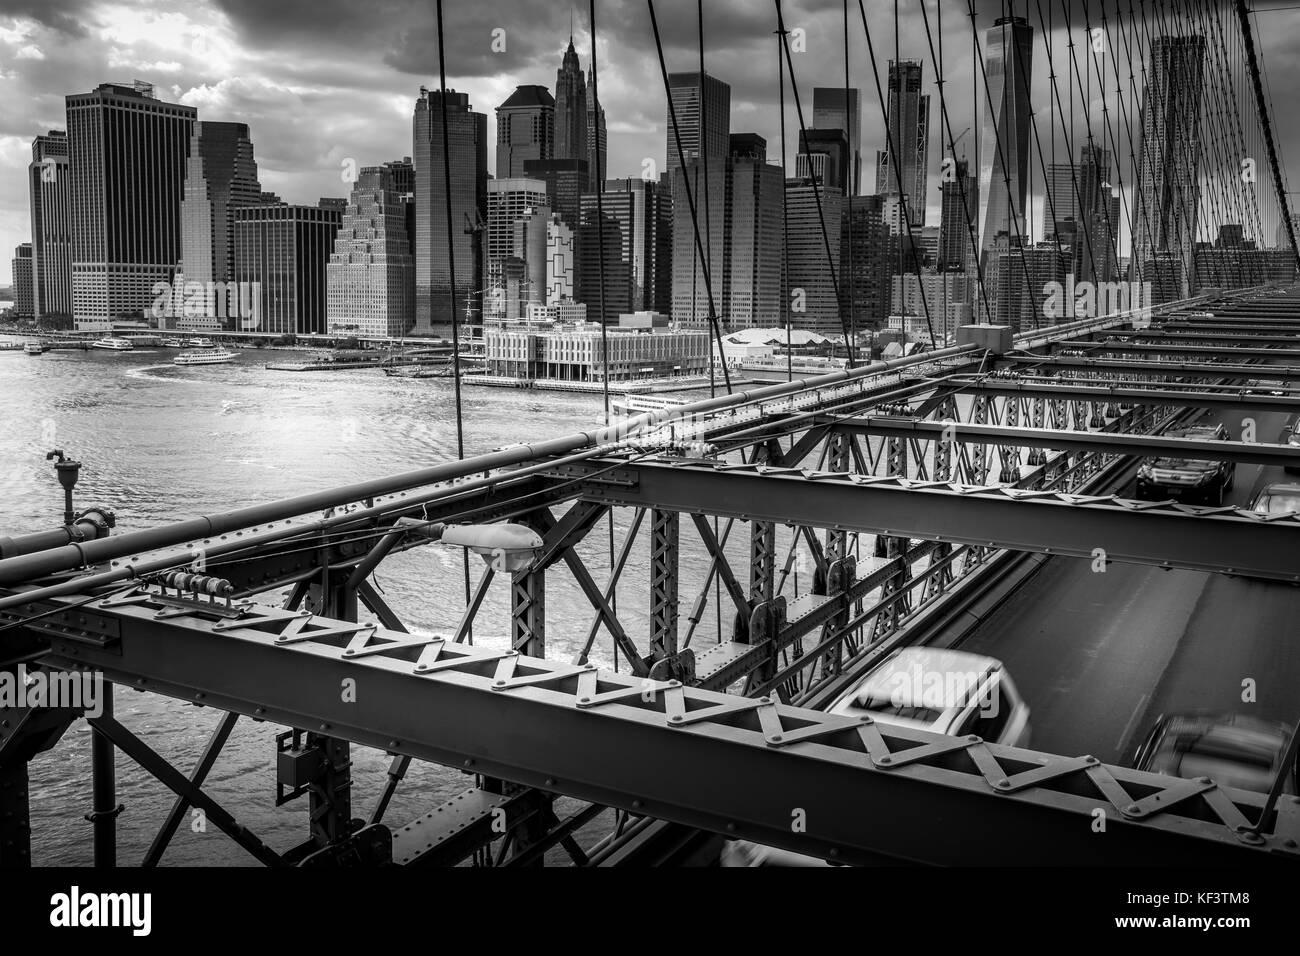 Manhattan viewed from Brooklyn Bridge - Stock Image